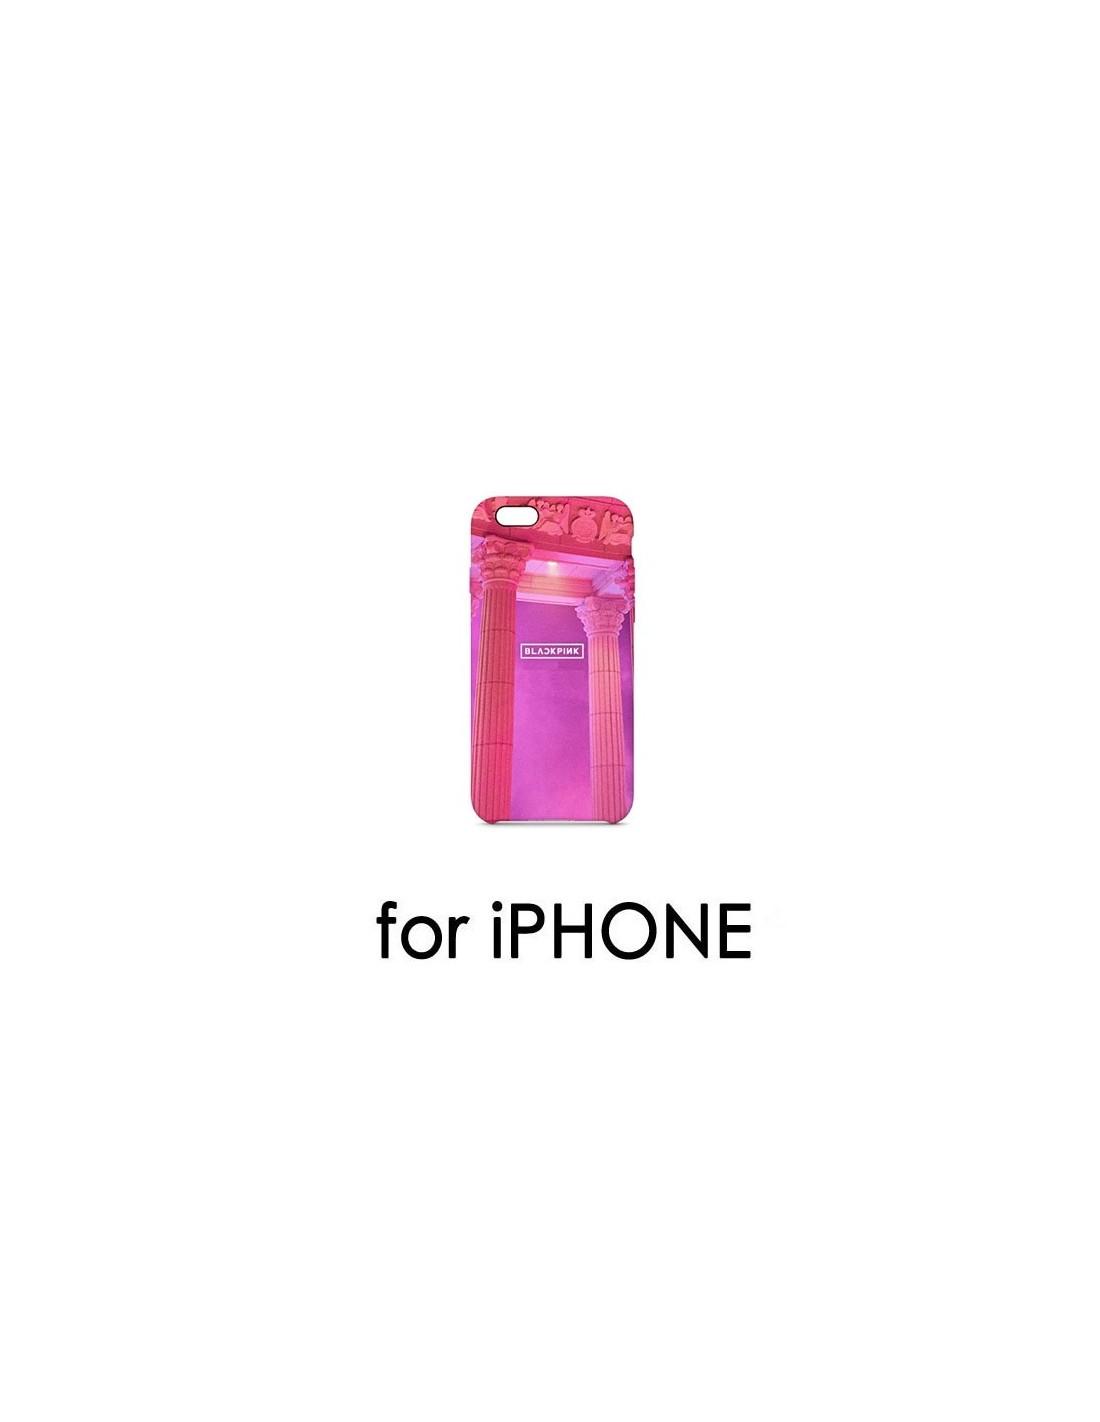 Iphone 7 Blue Accessory